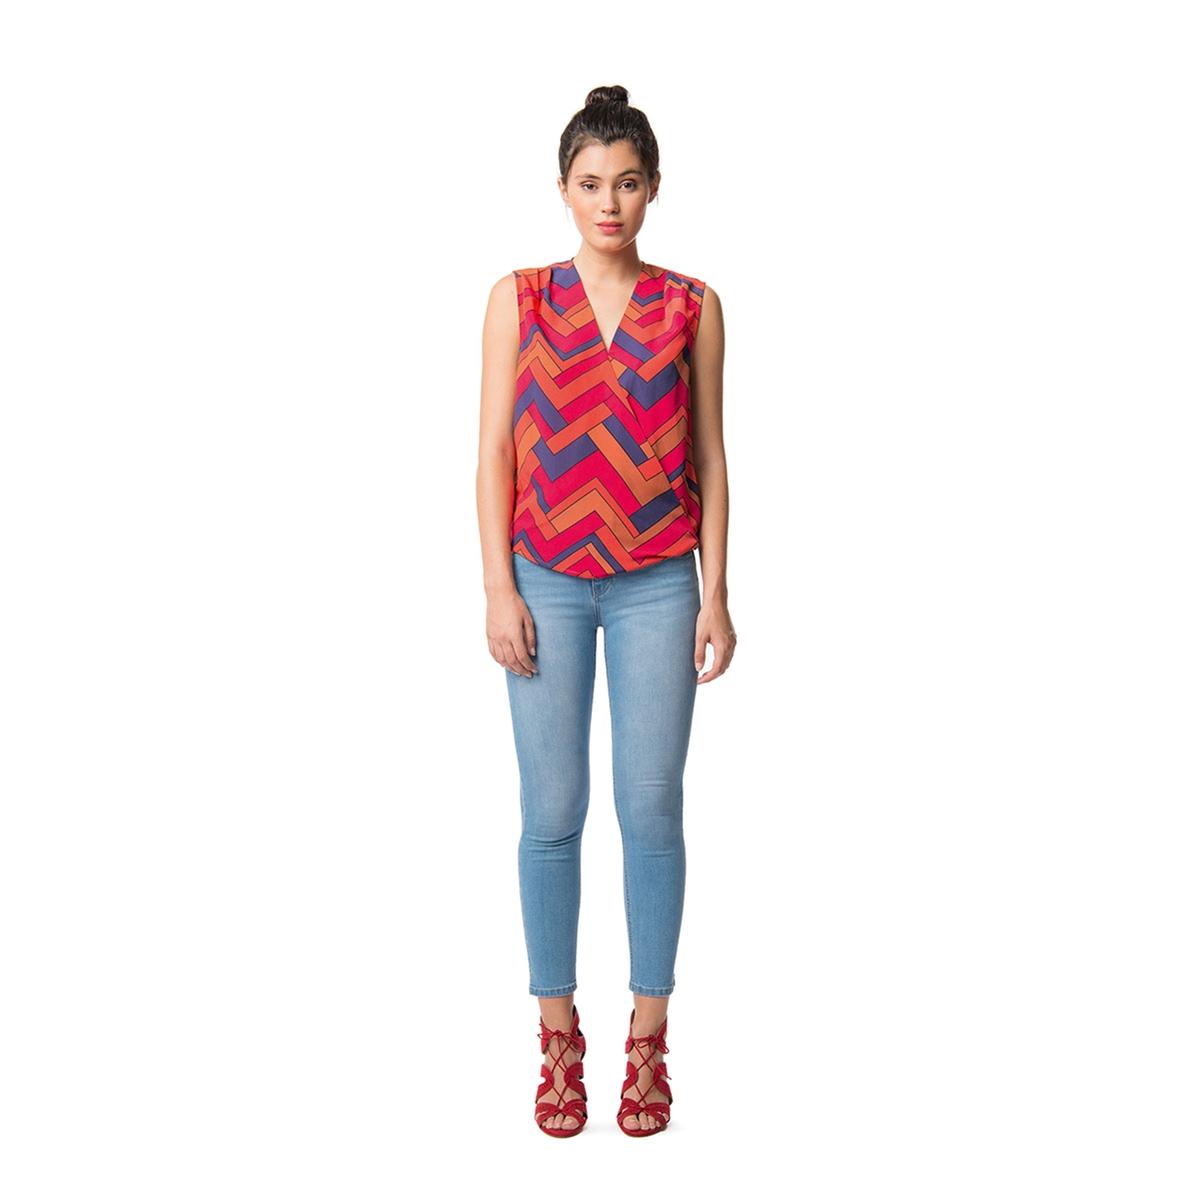 Блузка с V-образным вырезом и графическим рисунком, без рукавов блузка quelle b c best connections by heine 6498